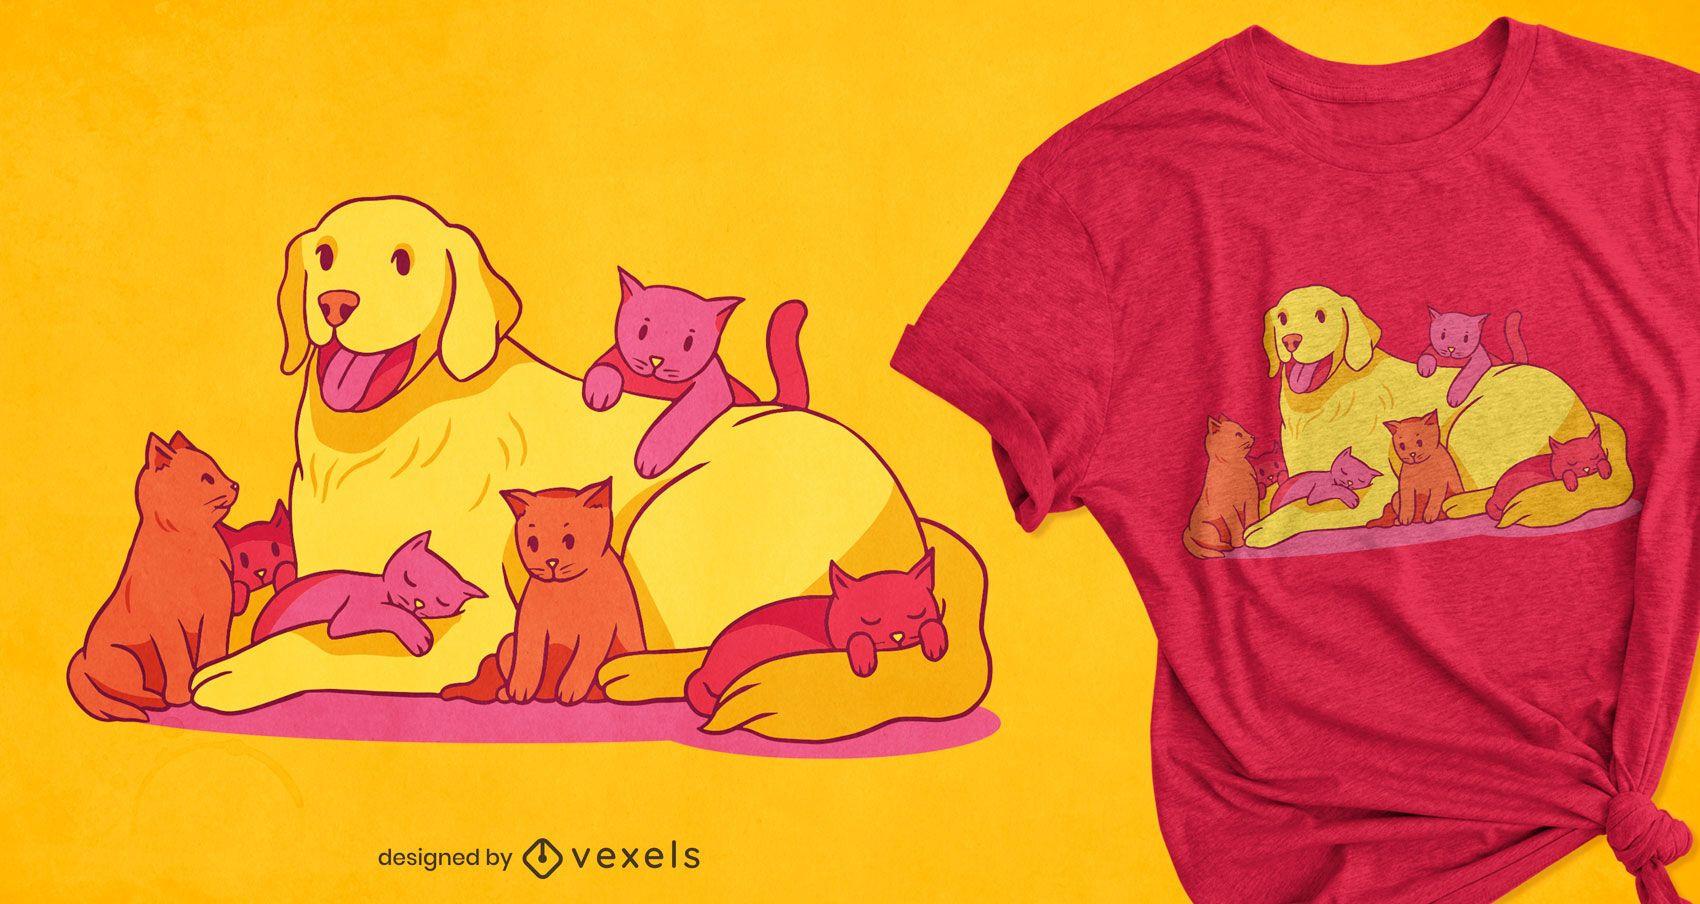 Dog and kittens t-shirt design